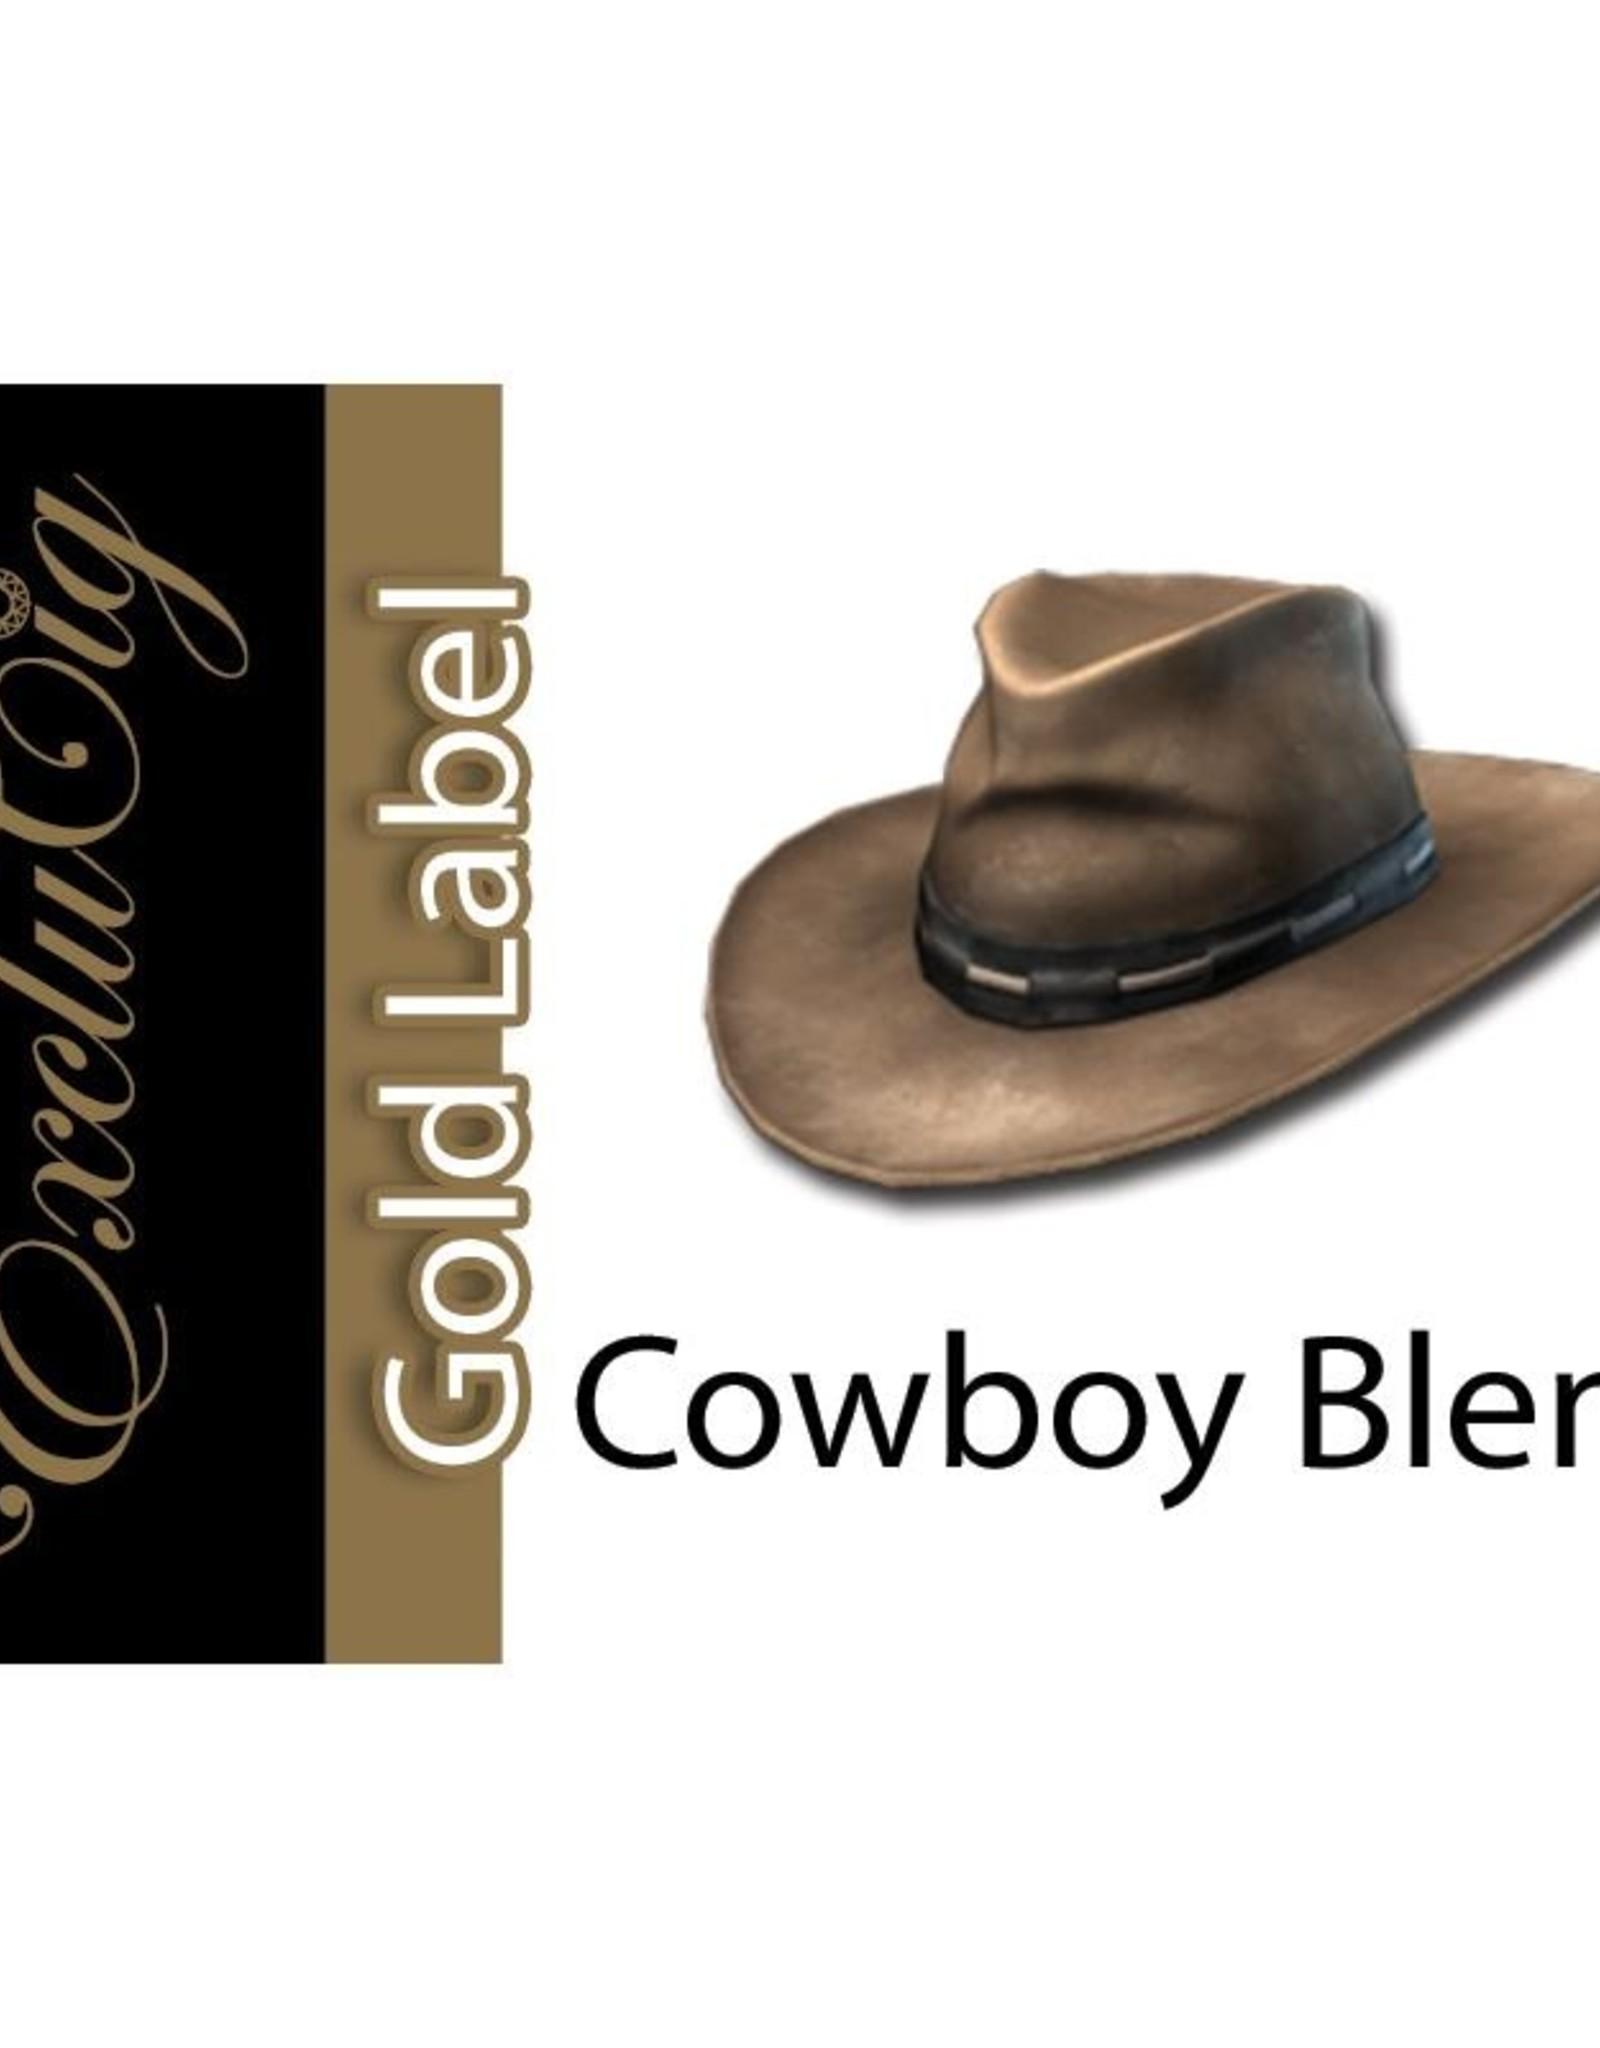 Exclucig Exclucig Gold Label E-liquid Cowboy Blend 6 mg Nicotine